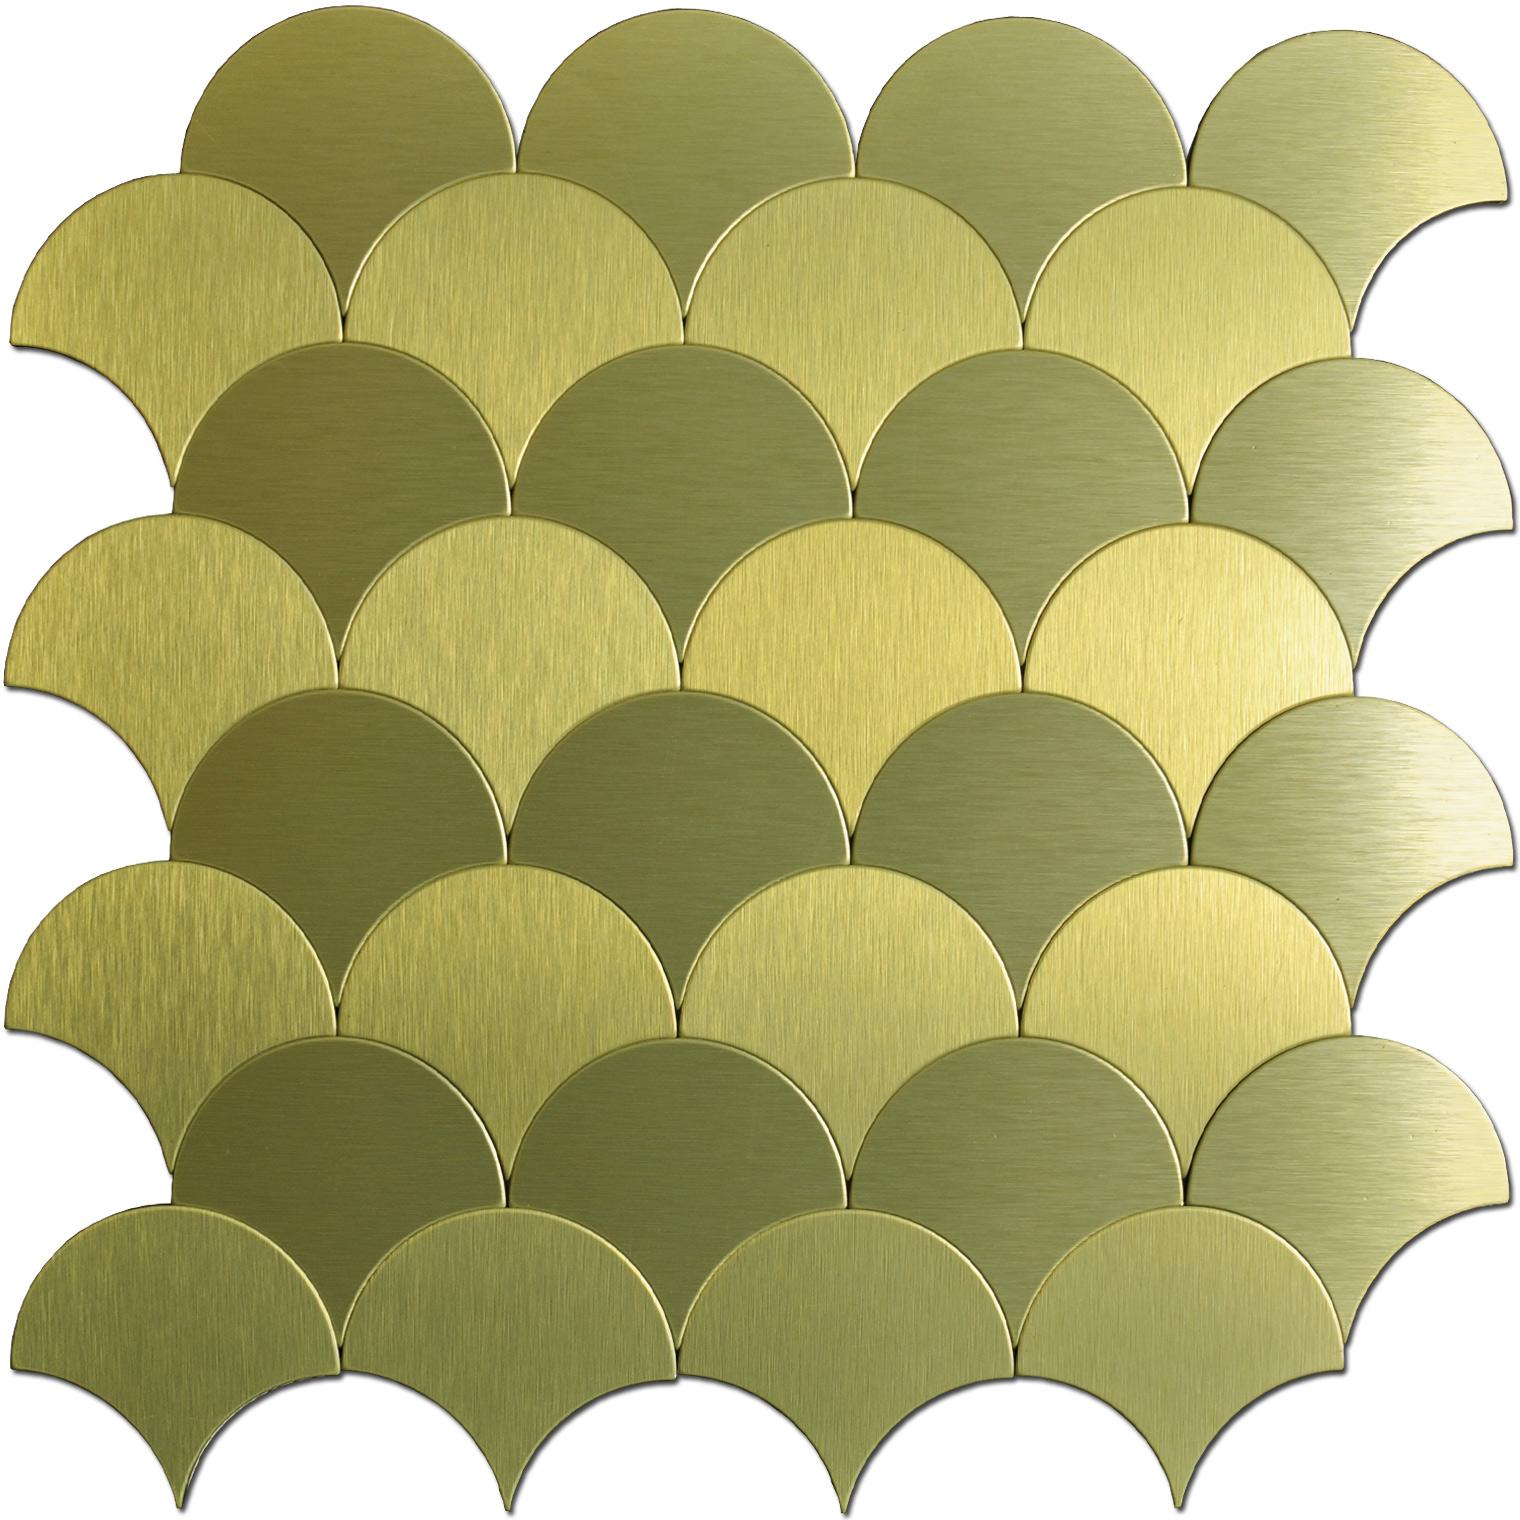 10 Sheets Fan-shaped Metal Mosaic Gold Peel N Stick Backsplashes Tiles